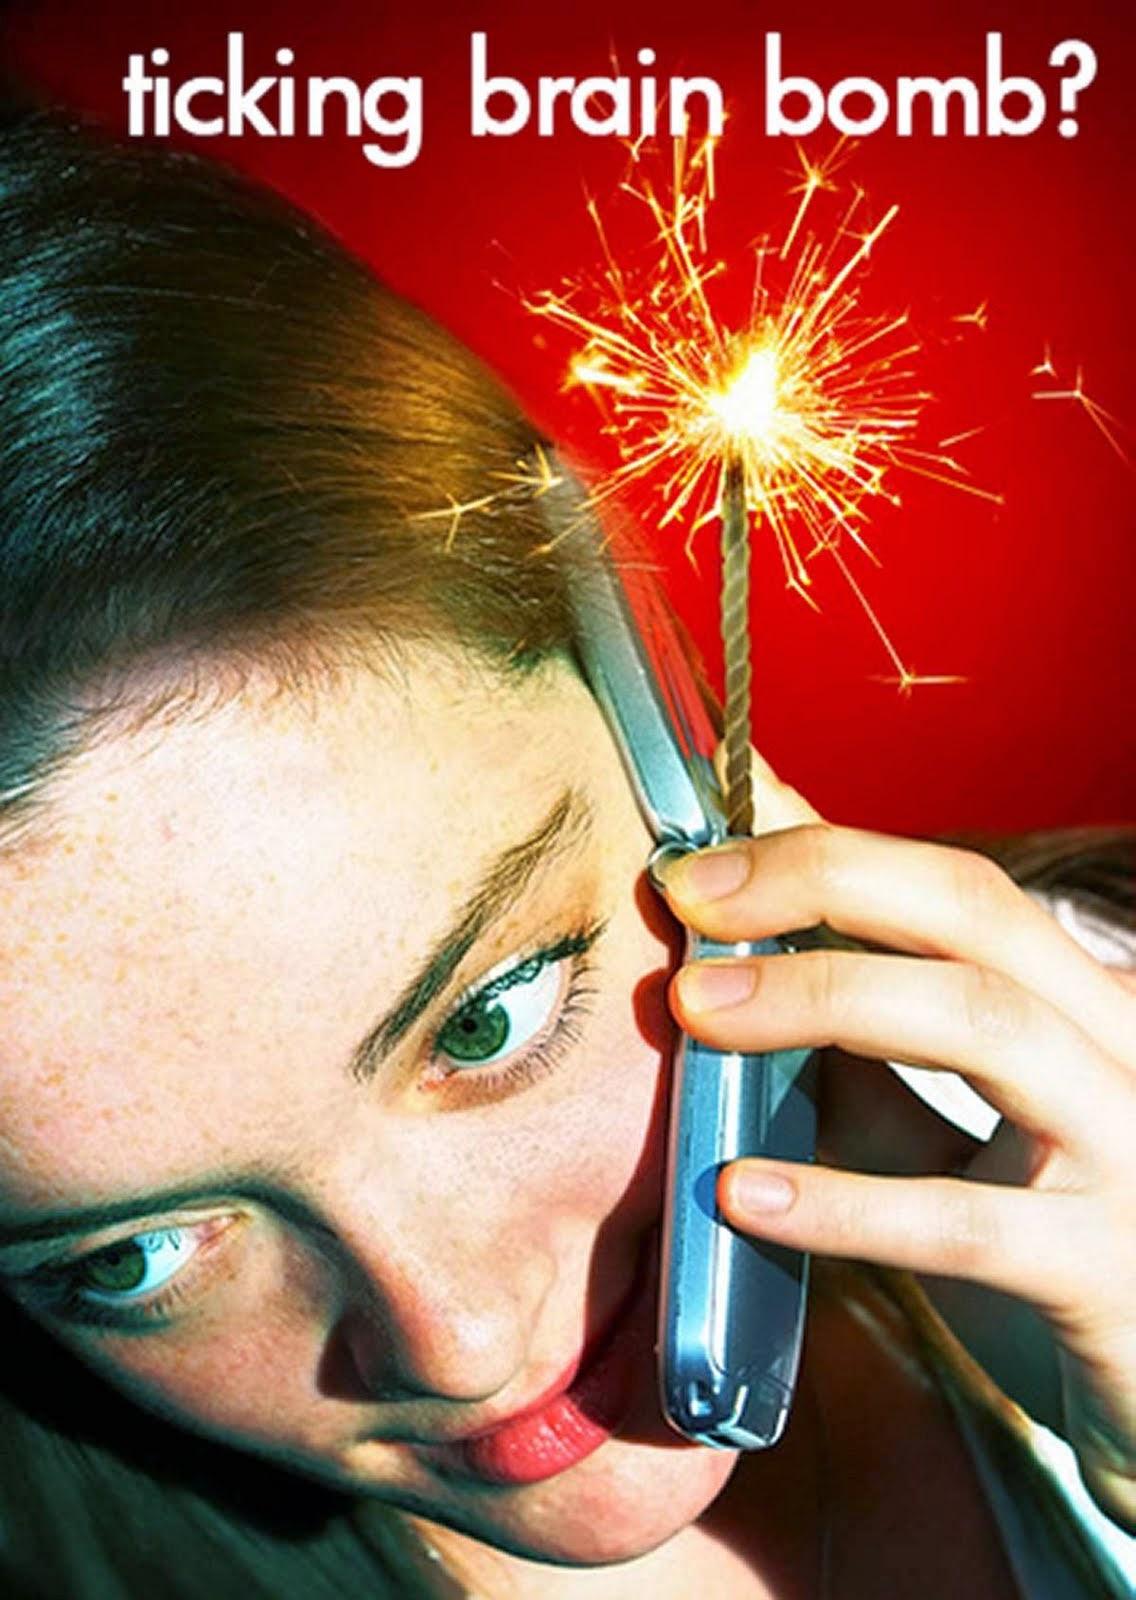 Ticking brain bomb? mobile phone risks